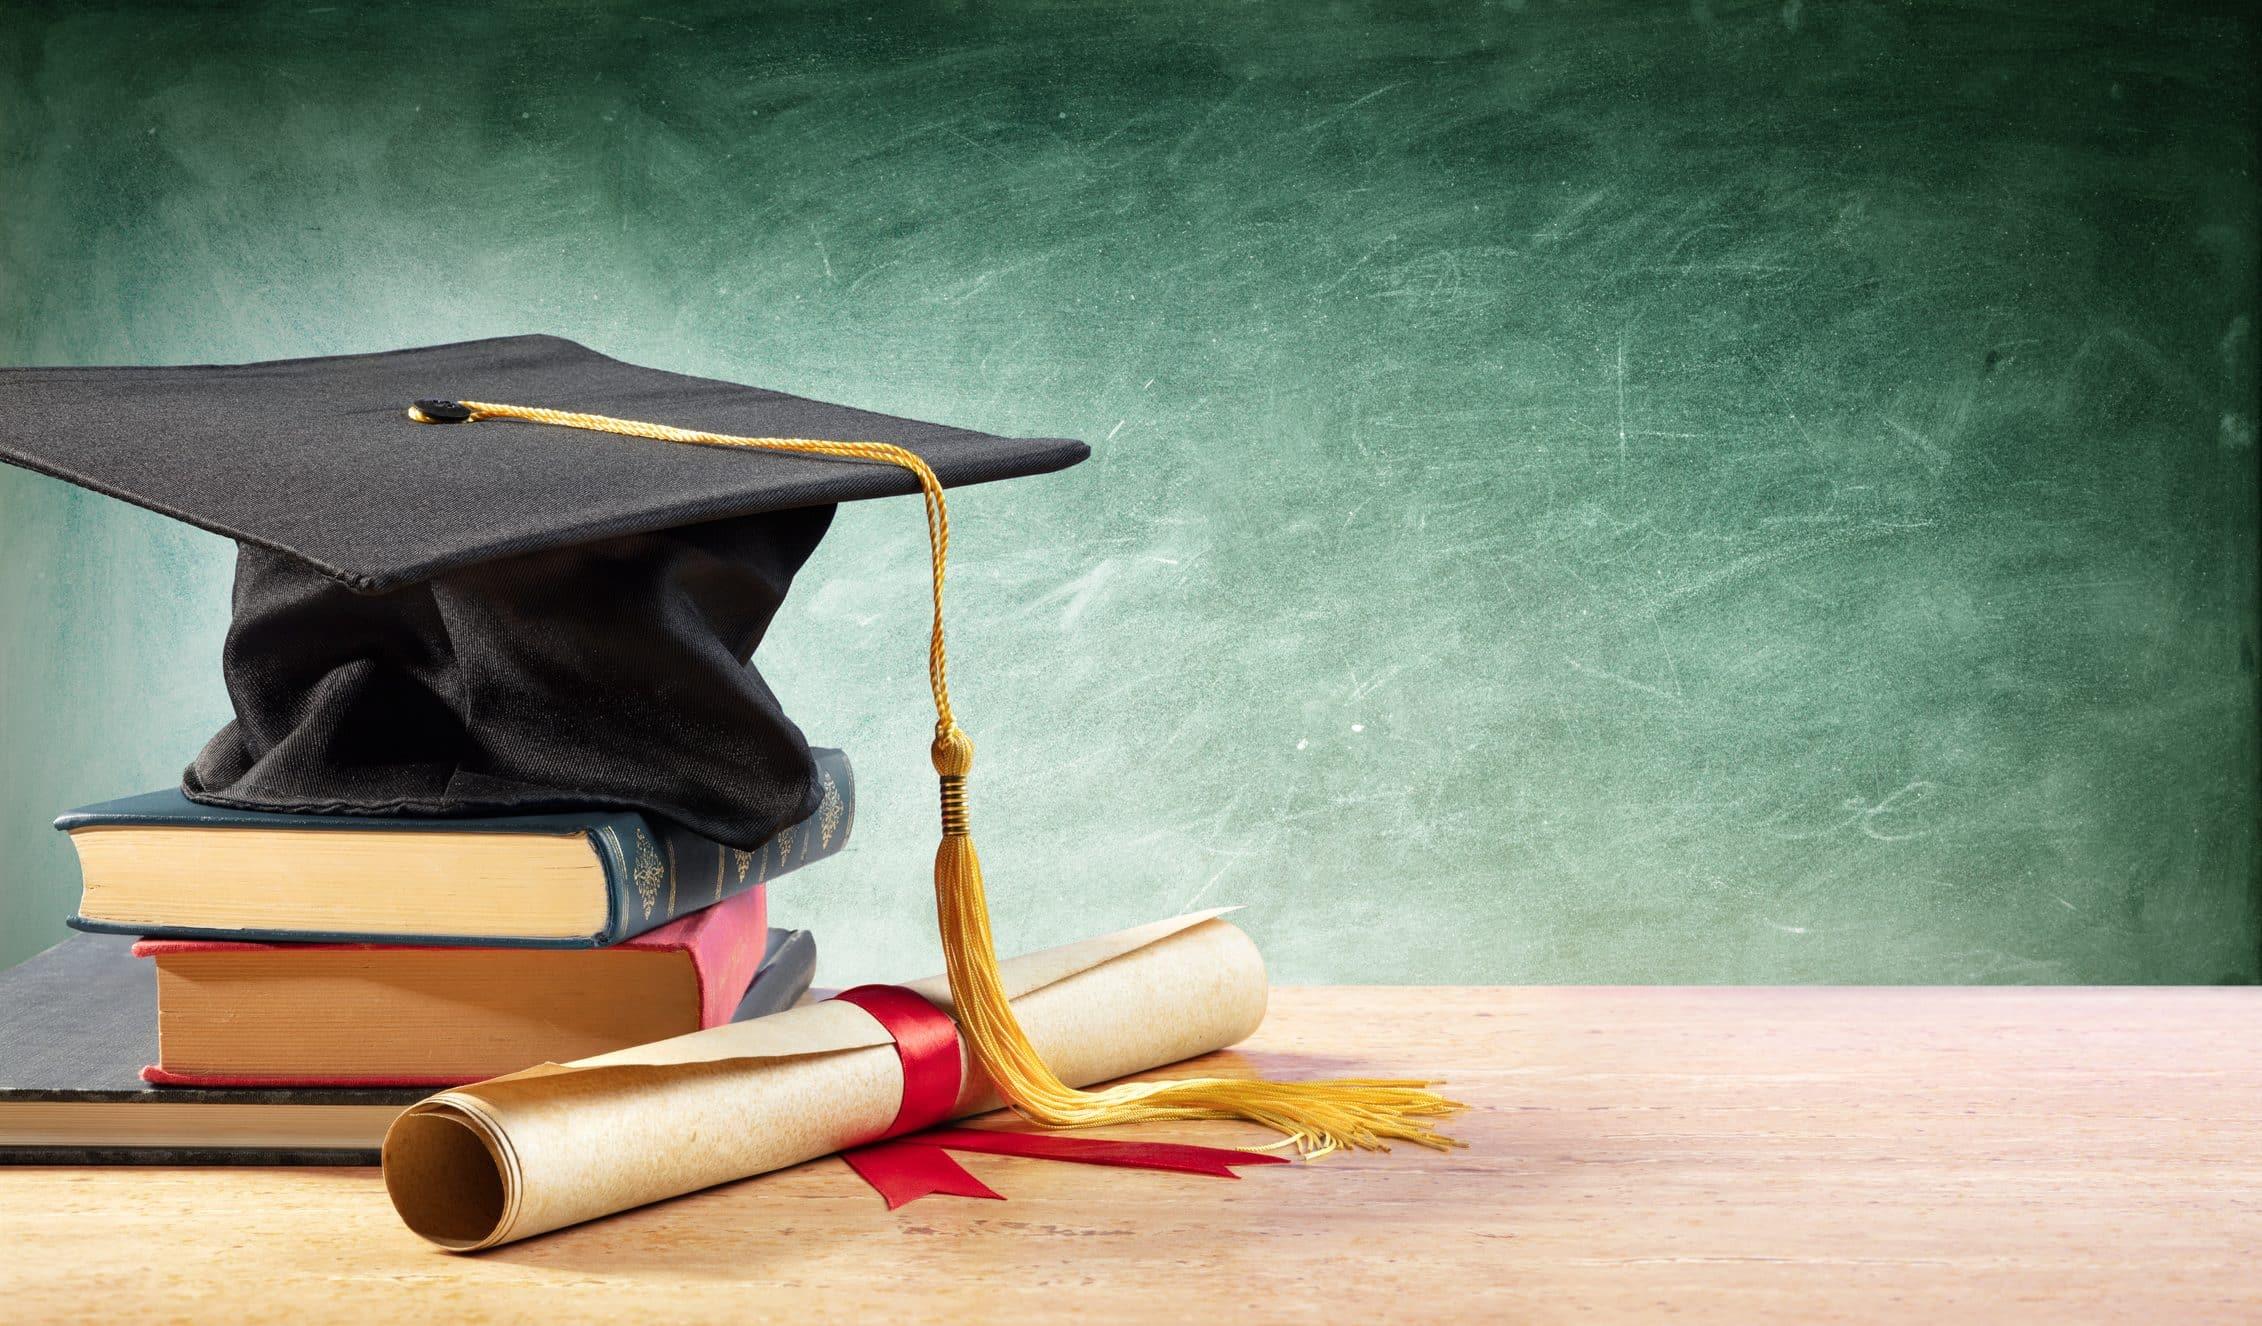 A graduation cap and diploma.